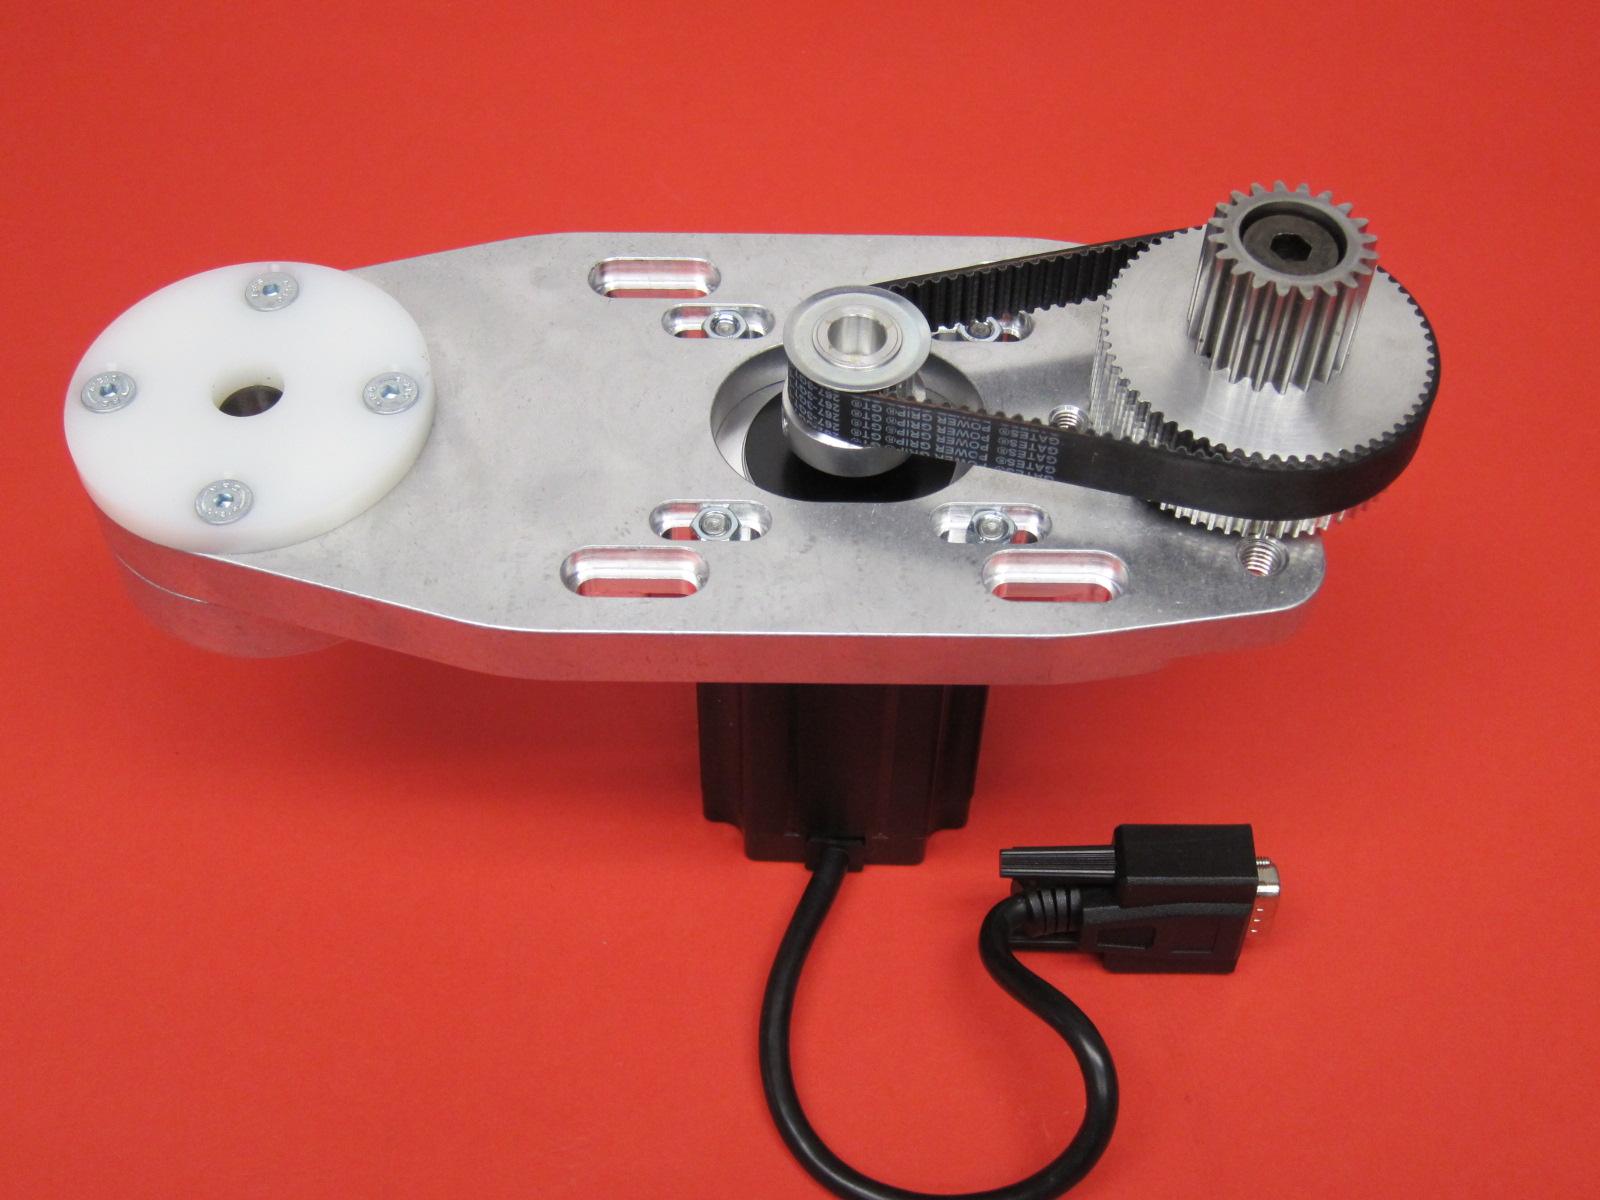 Pro Rack And Pinion Drive Nema 23 Avid Cnc Cnc Router